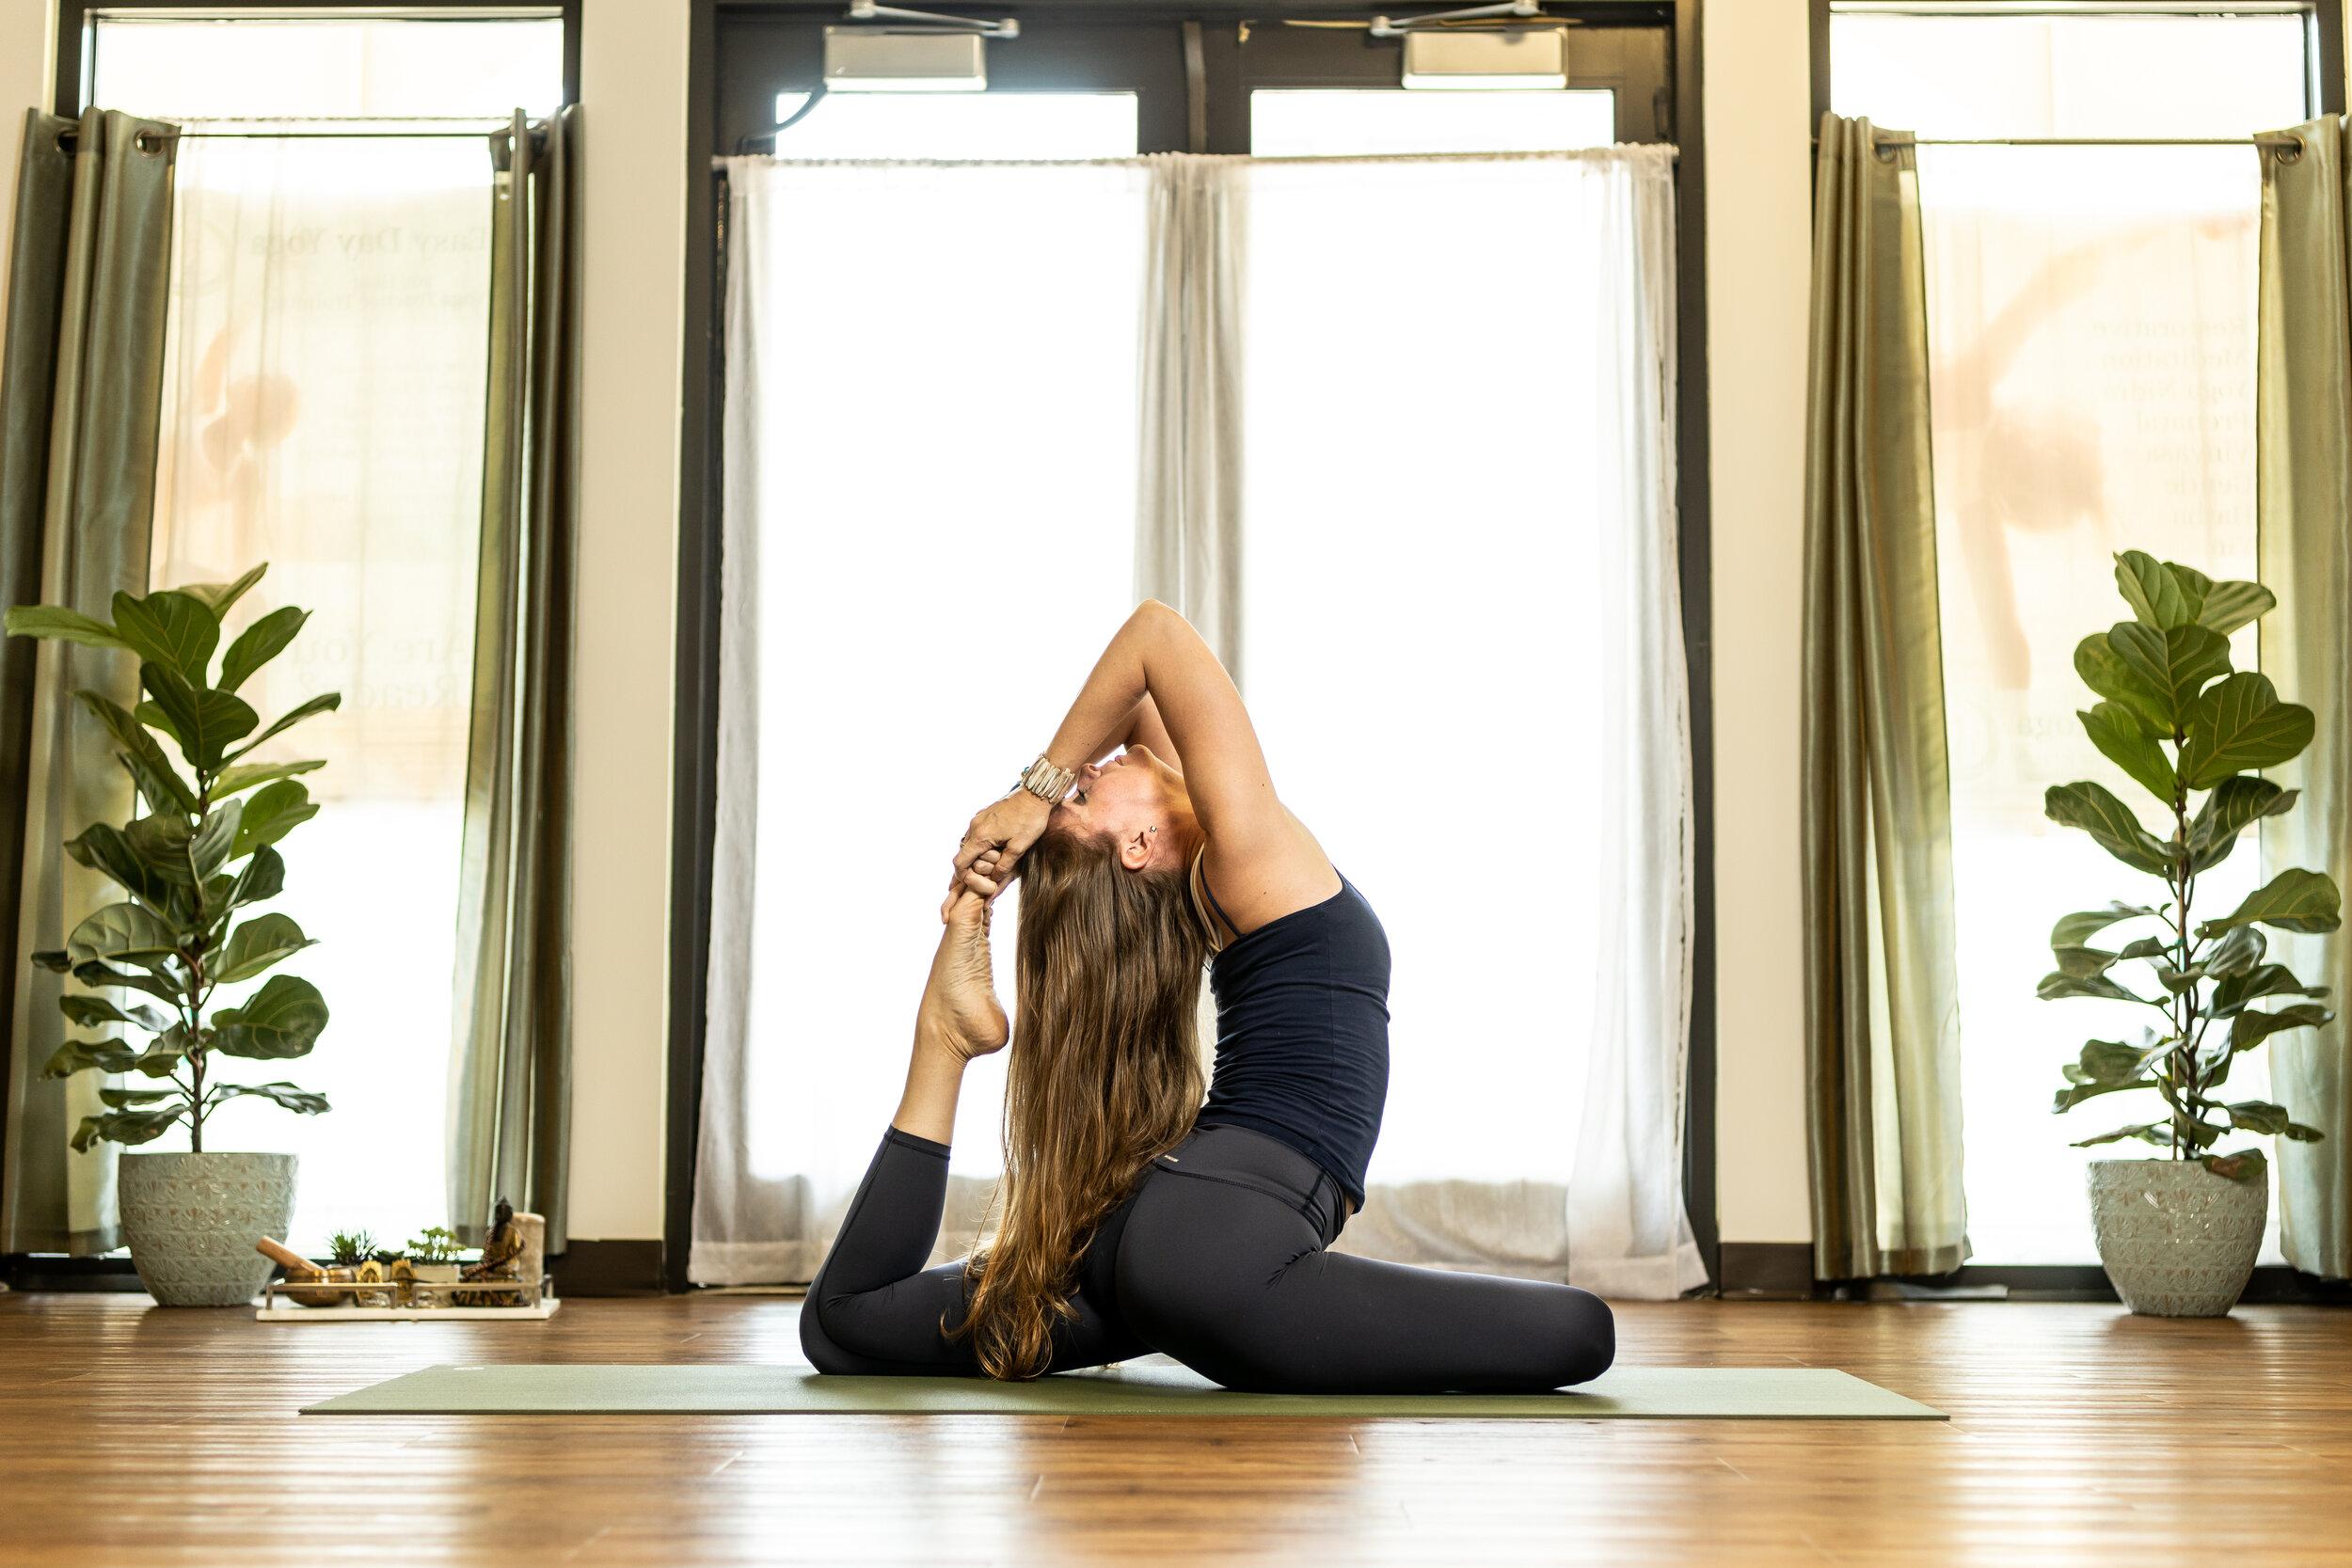 Parry Dale, Vinyasa teacher at Easy Day Yoga in Ashburn, Va.